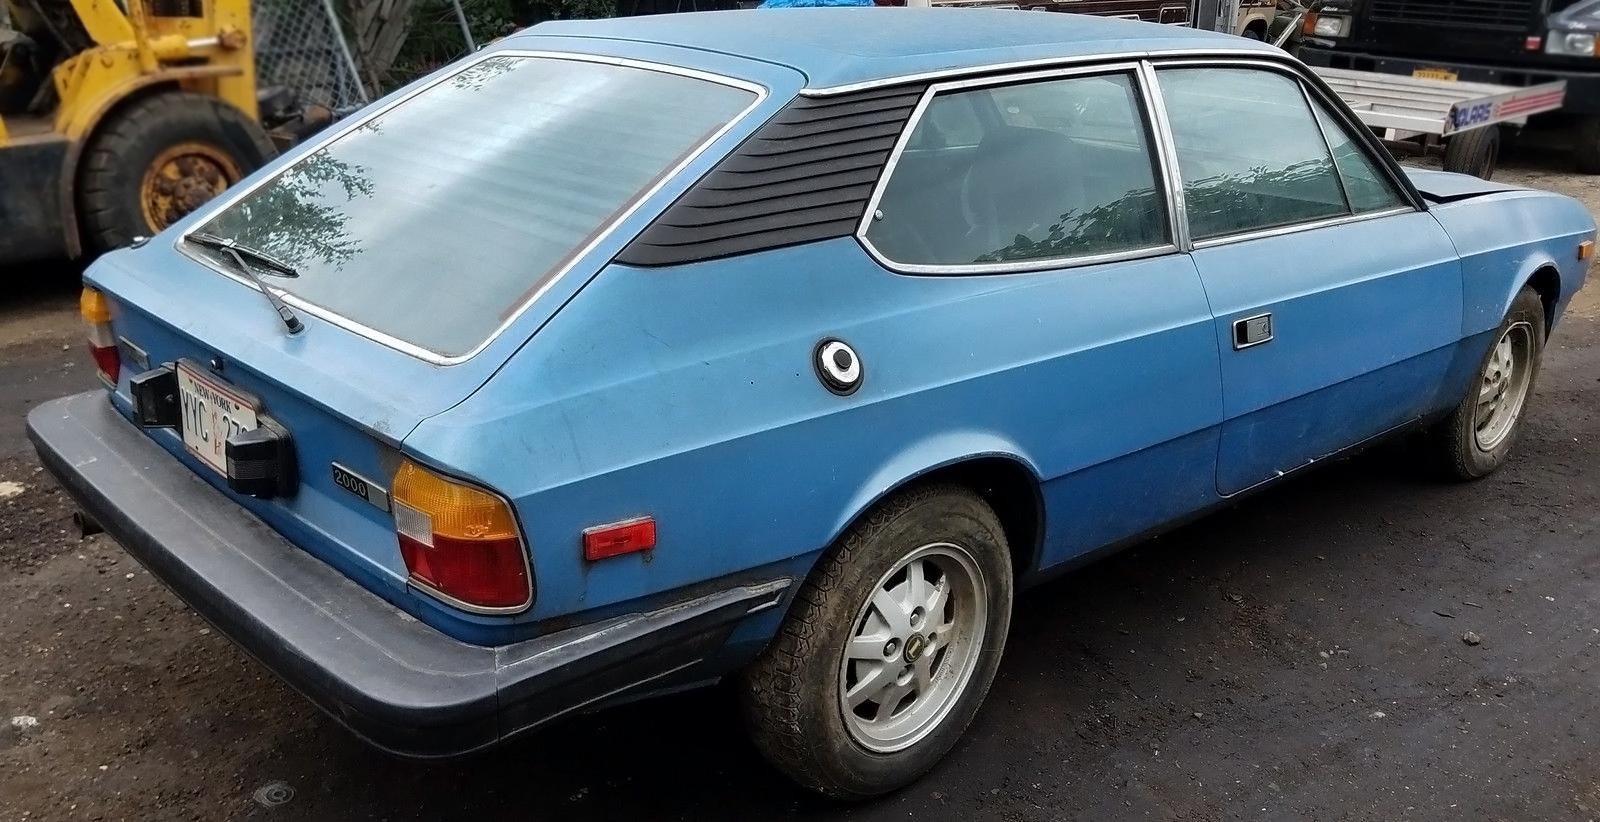 https://barnfinds.com/wp-content/uploads/2016/06/062716-Barn-Finds-1979-Lancia-HPE-2000-2.jpg